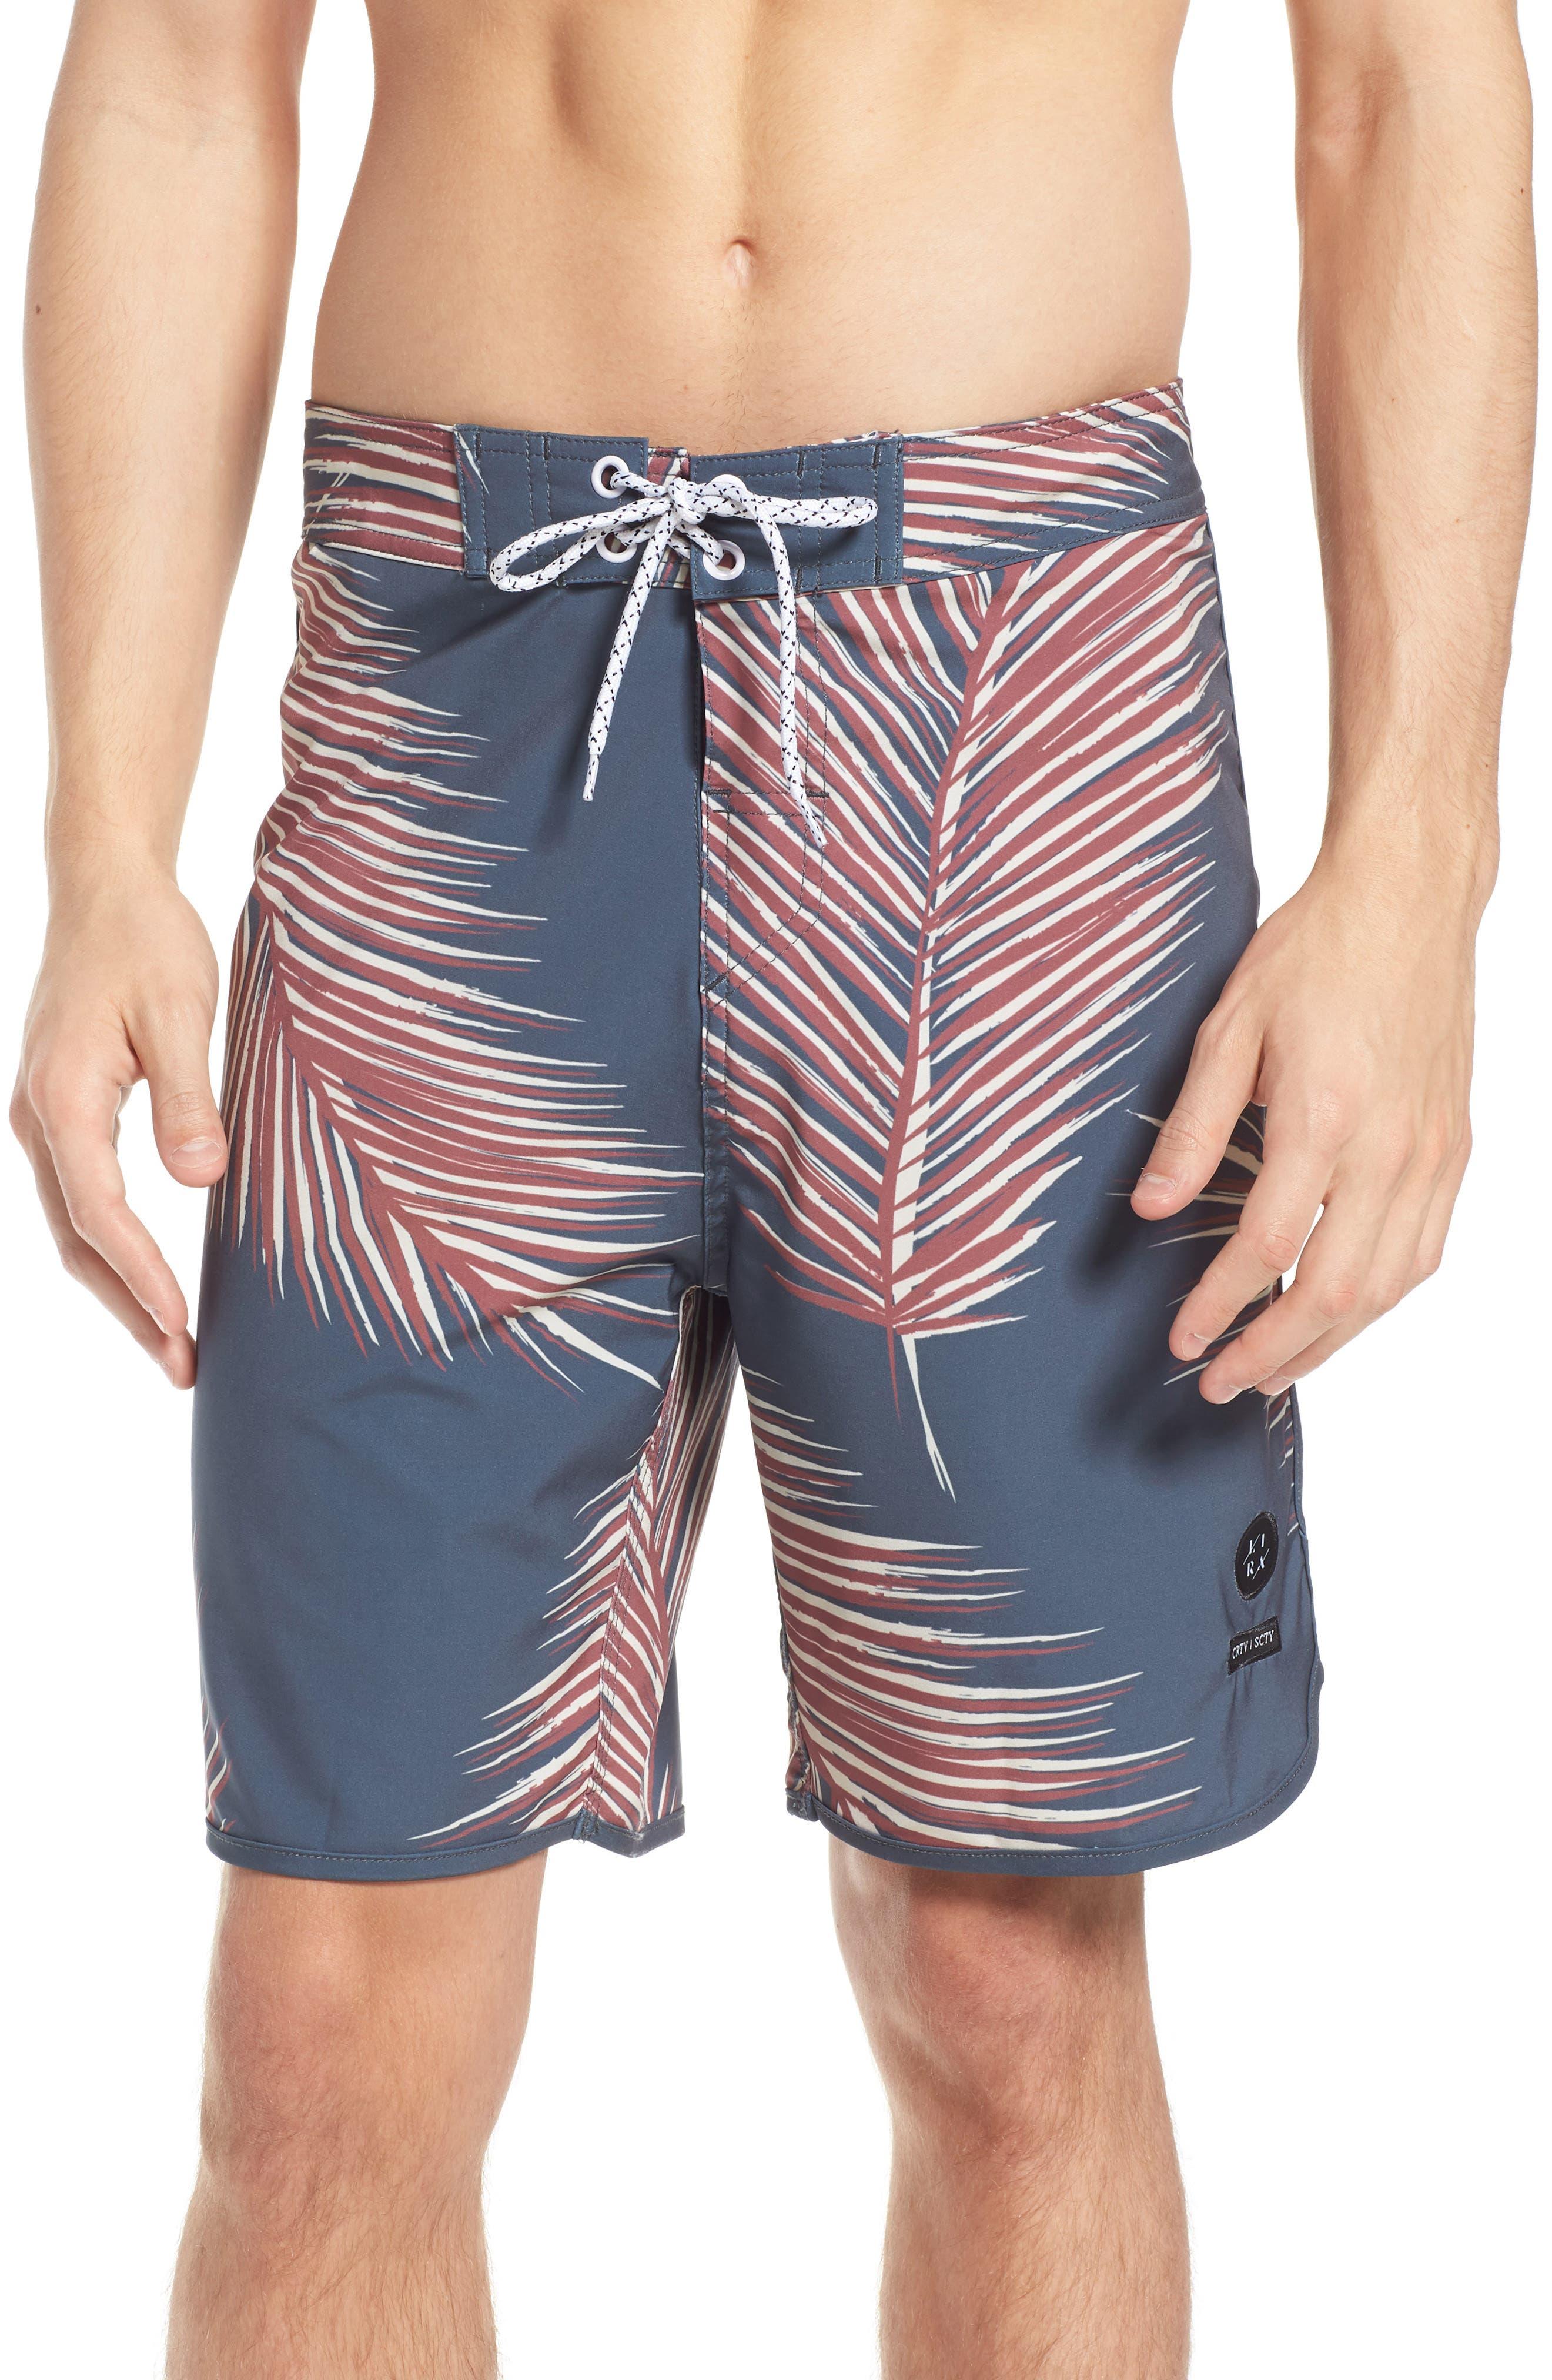 Lira Clothing Giant Palms Board Shorts